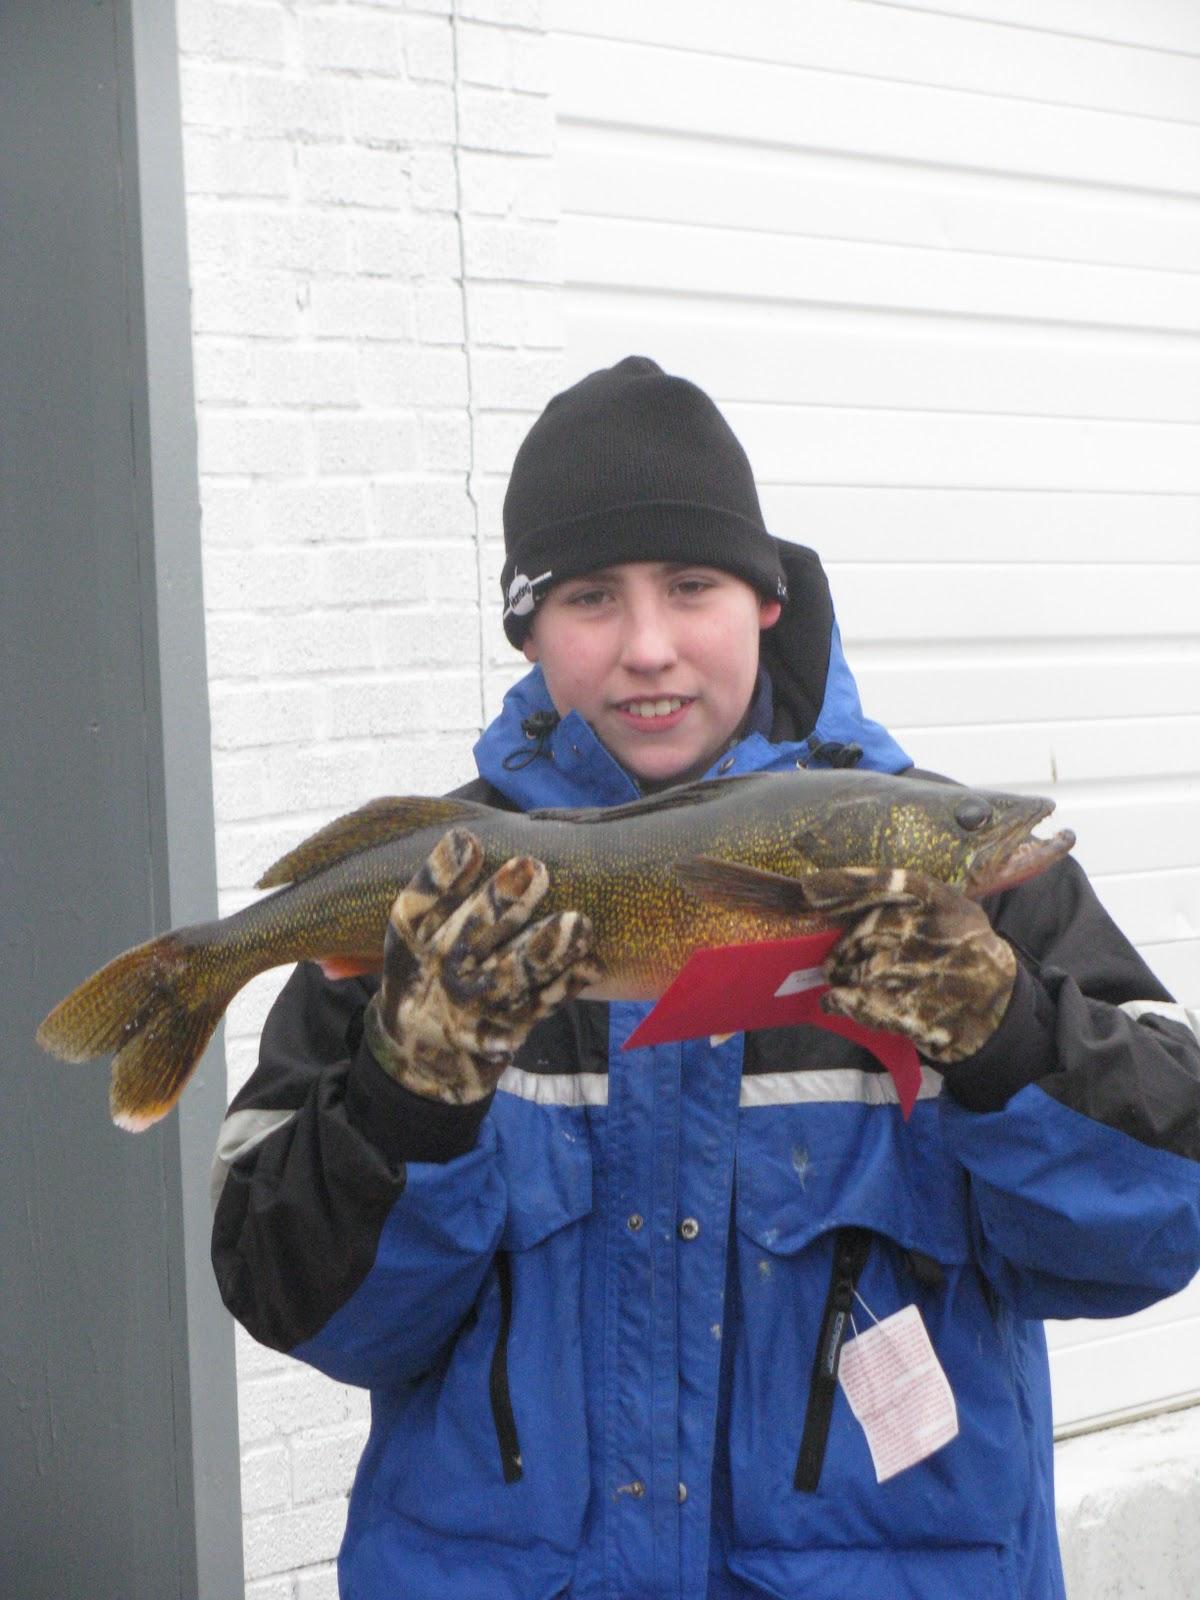 Houghton lake walleye report budd lake tournament 2 20 11 for Enid lake fishing report